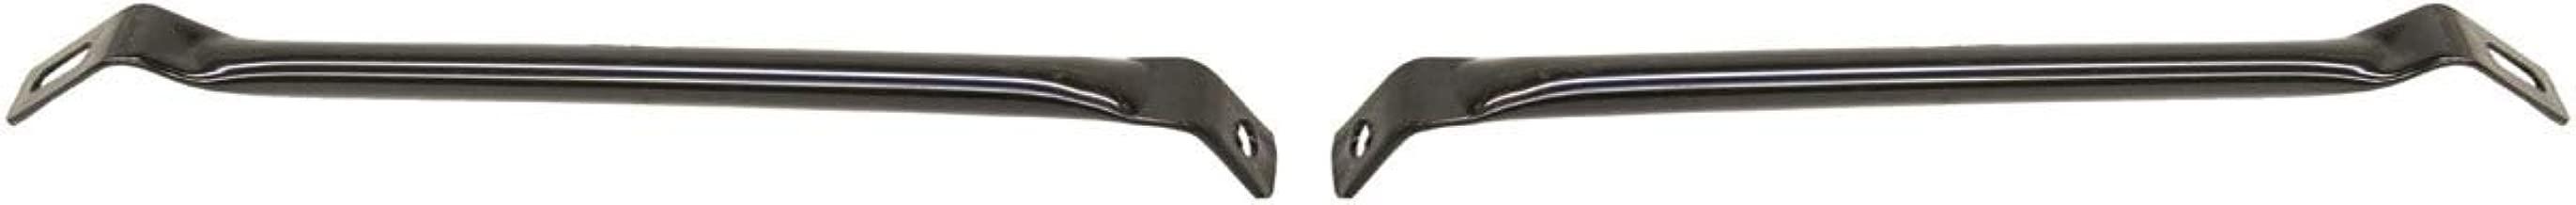 Radiator Support Set of 2 for Jeep Grand Cherokee 05-10 Center Right or Left Side Crossmember Brace